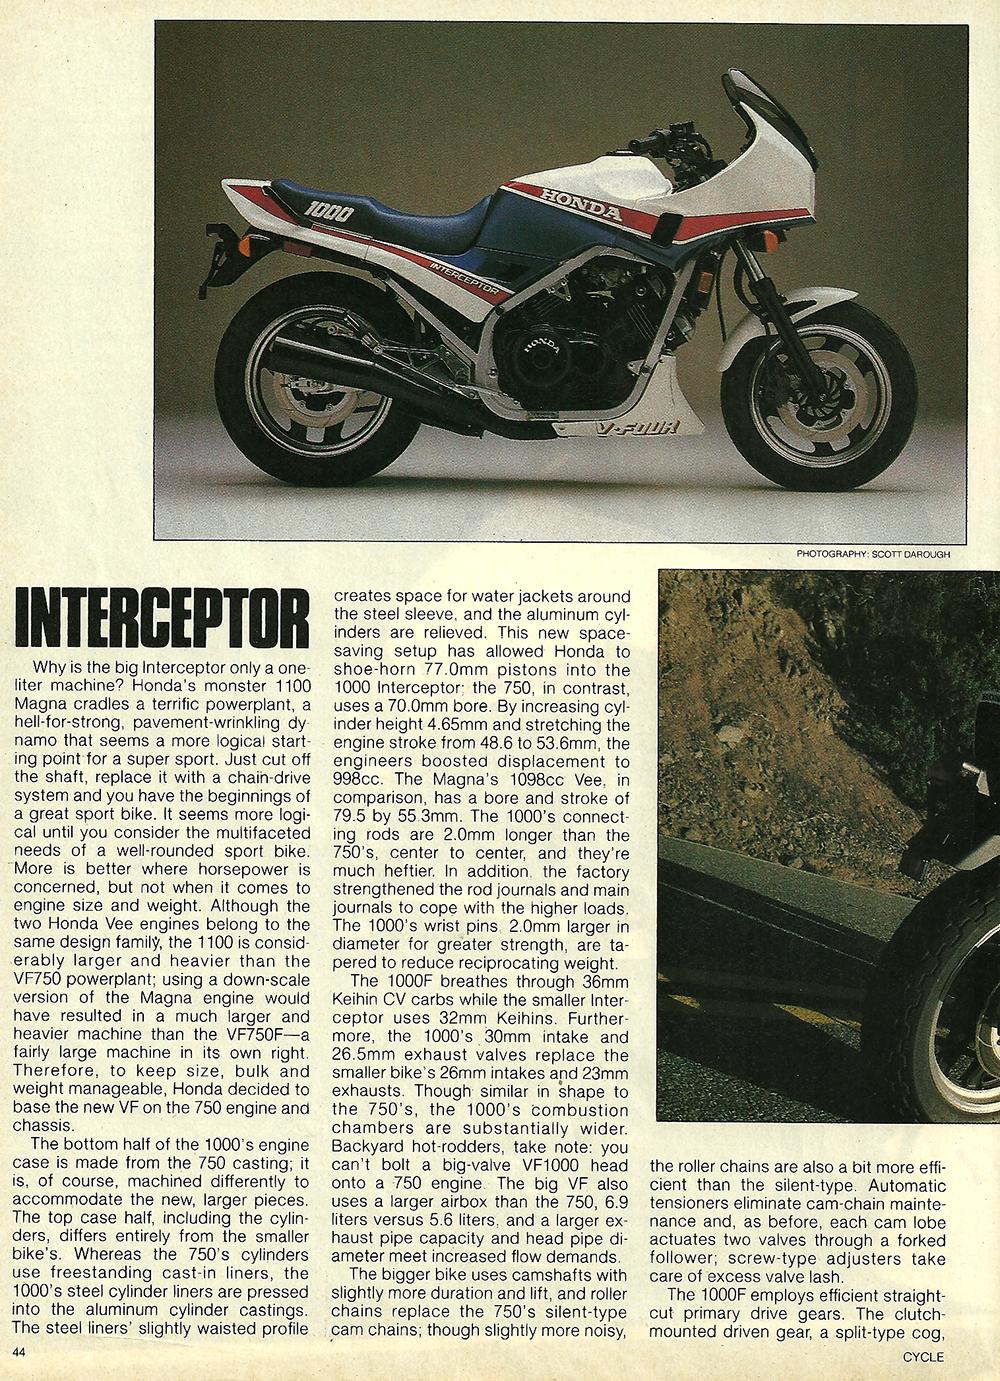 1984 Honda VF1000 Interceptor road test 3.jpg